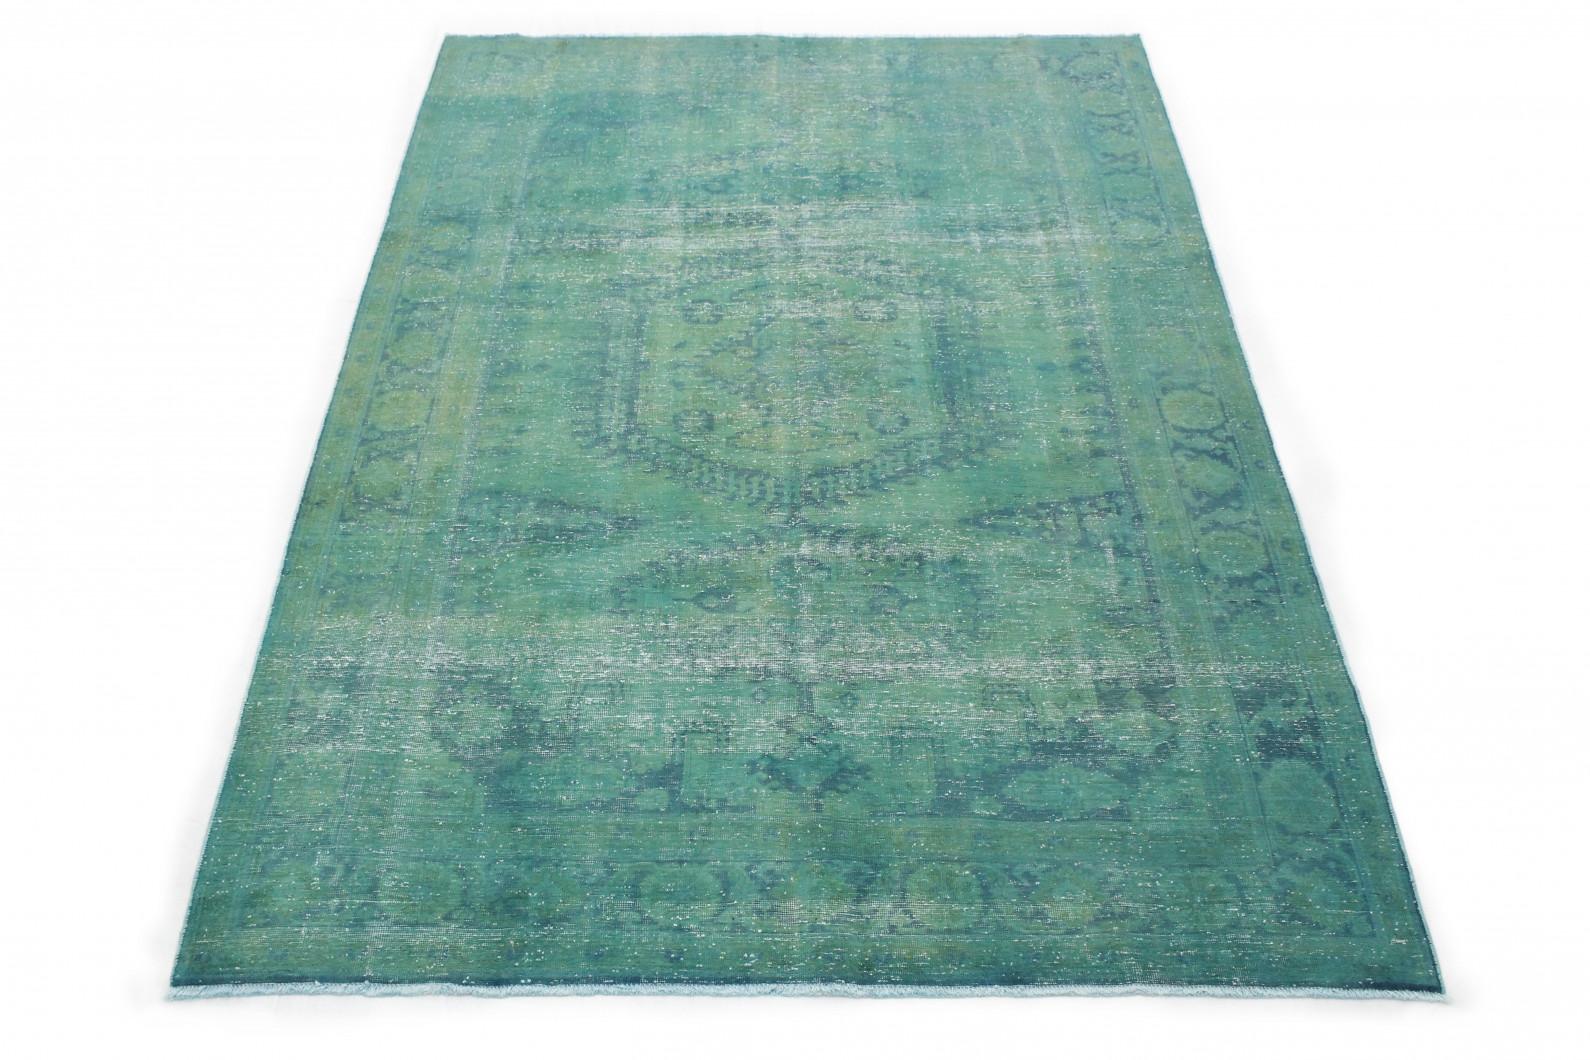 vintage teppich gr n in 300x200 1001 3563 bei kaufen. Black Bedroom Furniture Sets. Home Design Ideas